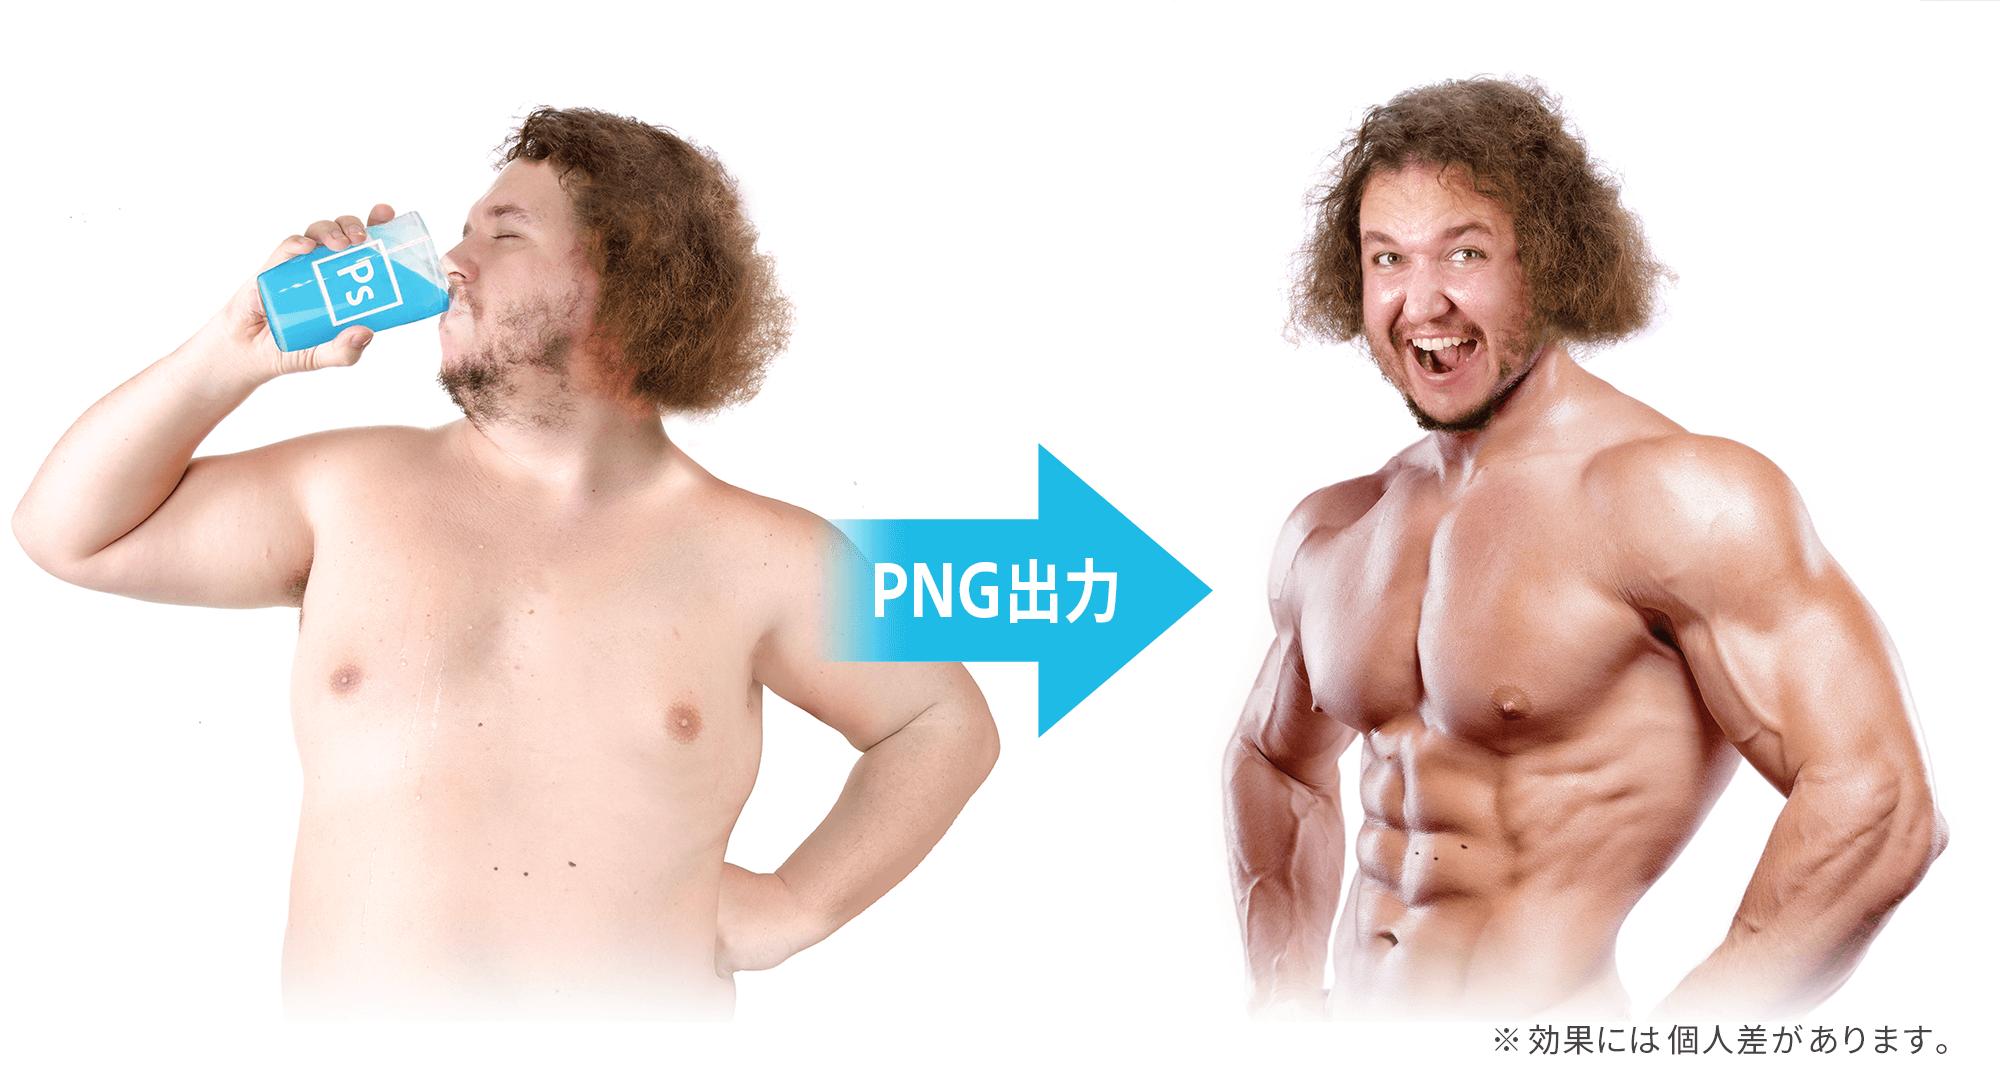 nomu-photoshop-preview